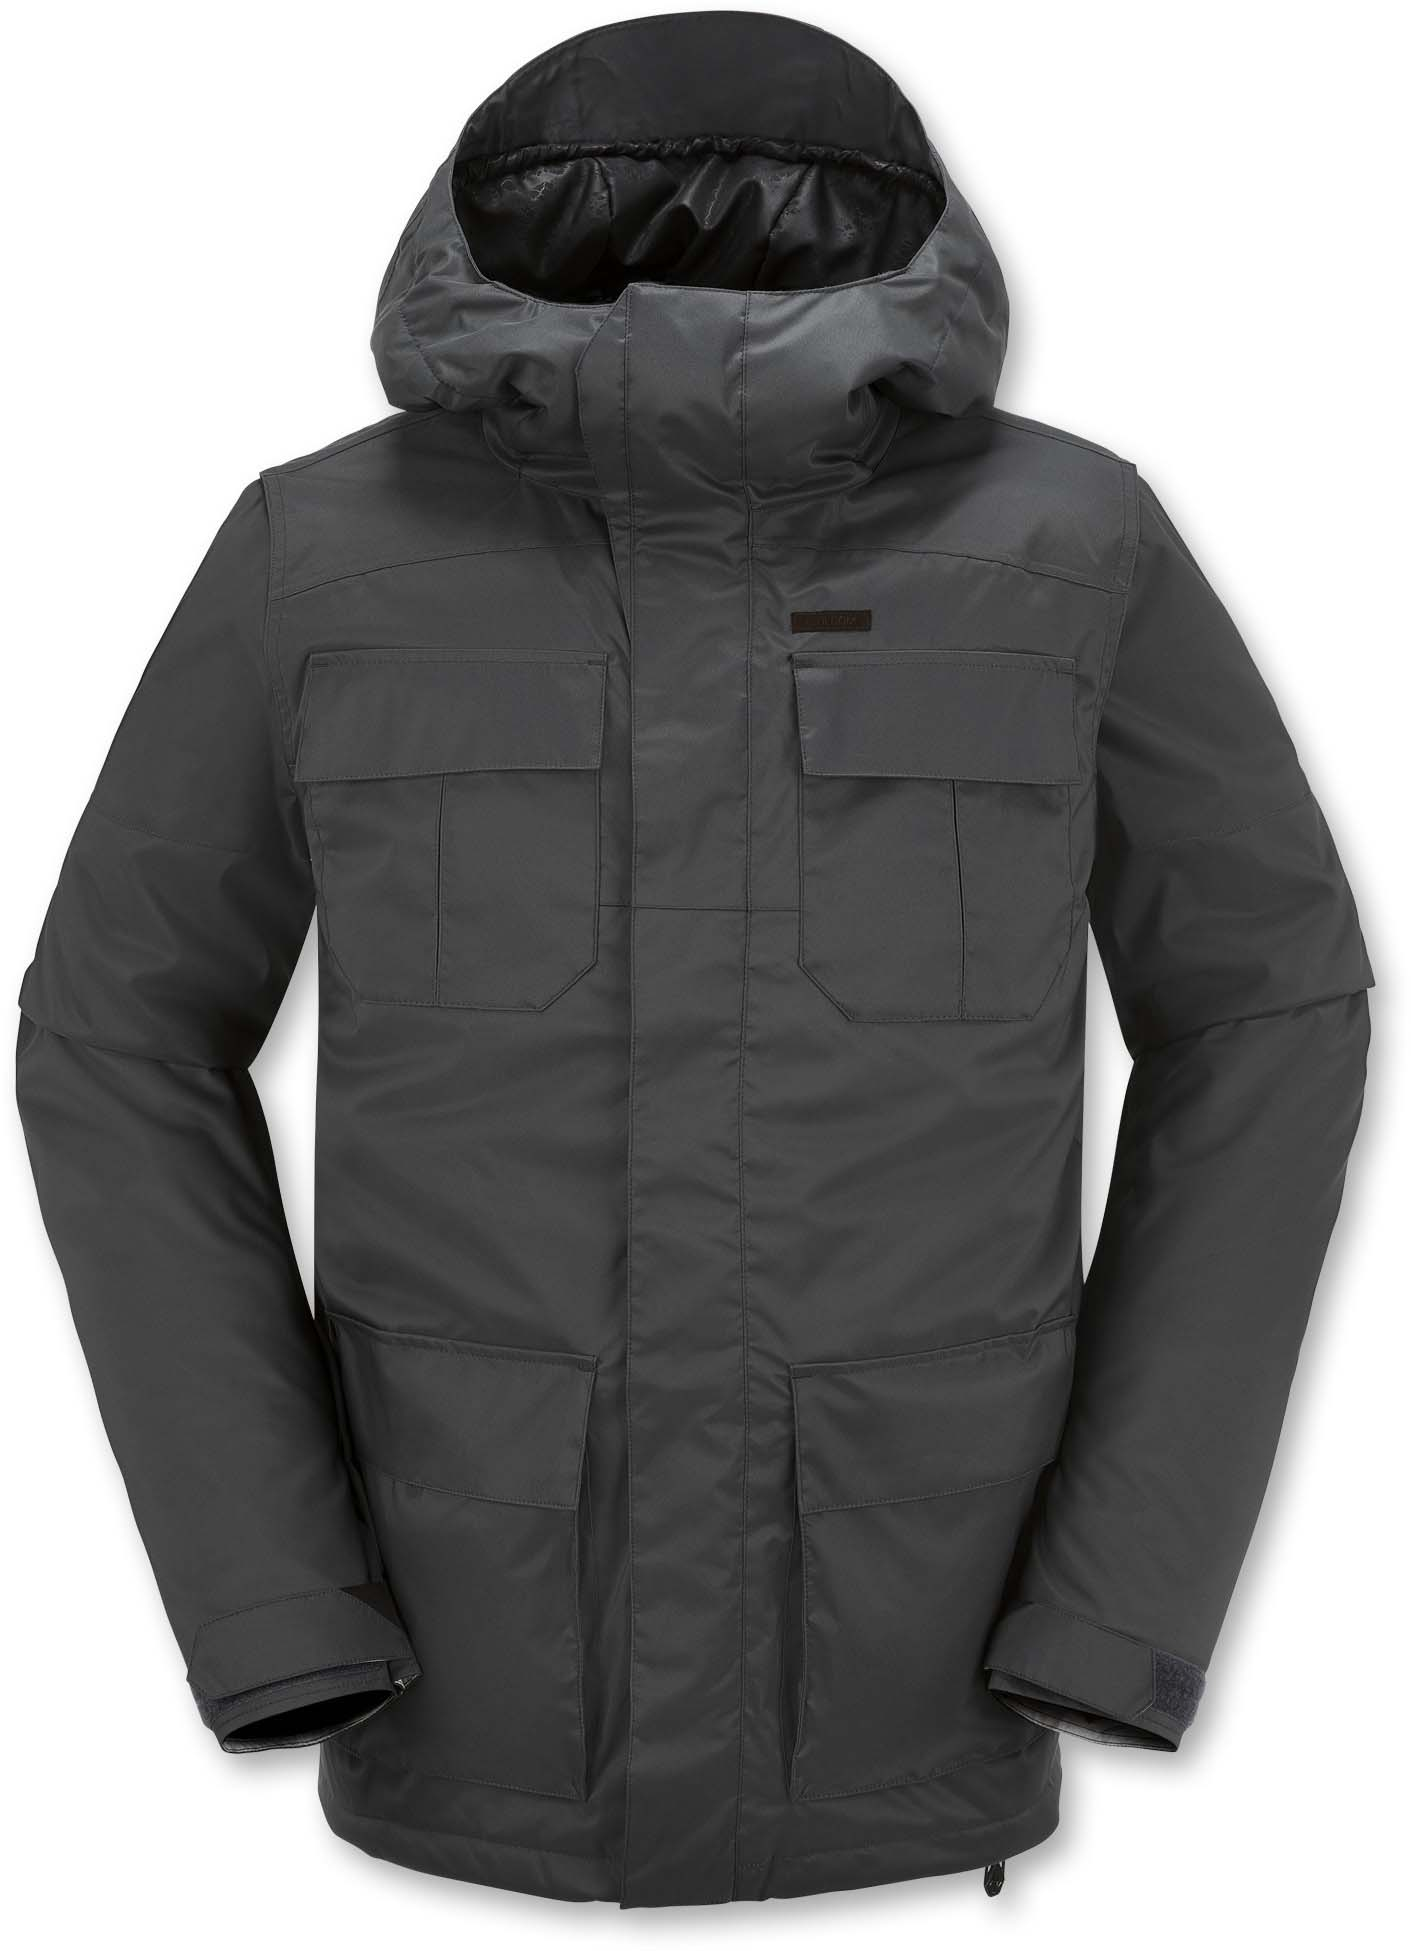 image volcom-alternate-insulated-jacket-charcoal-jpg